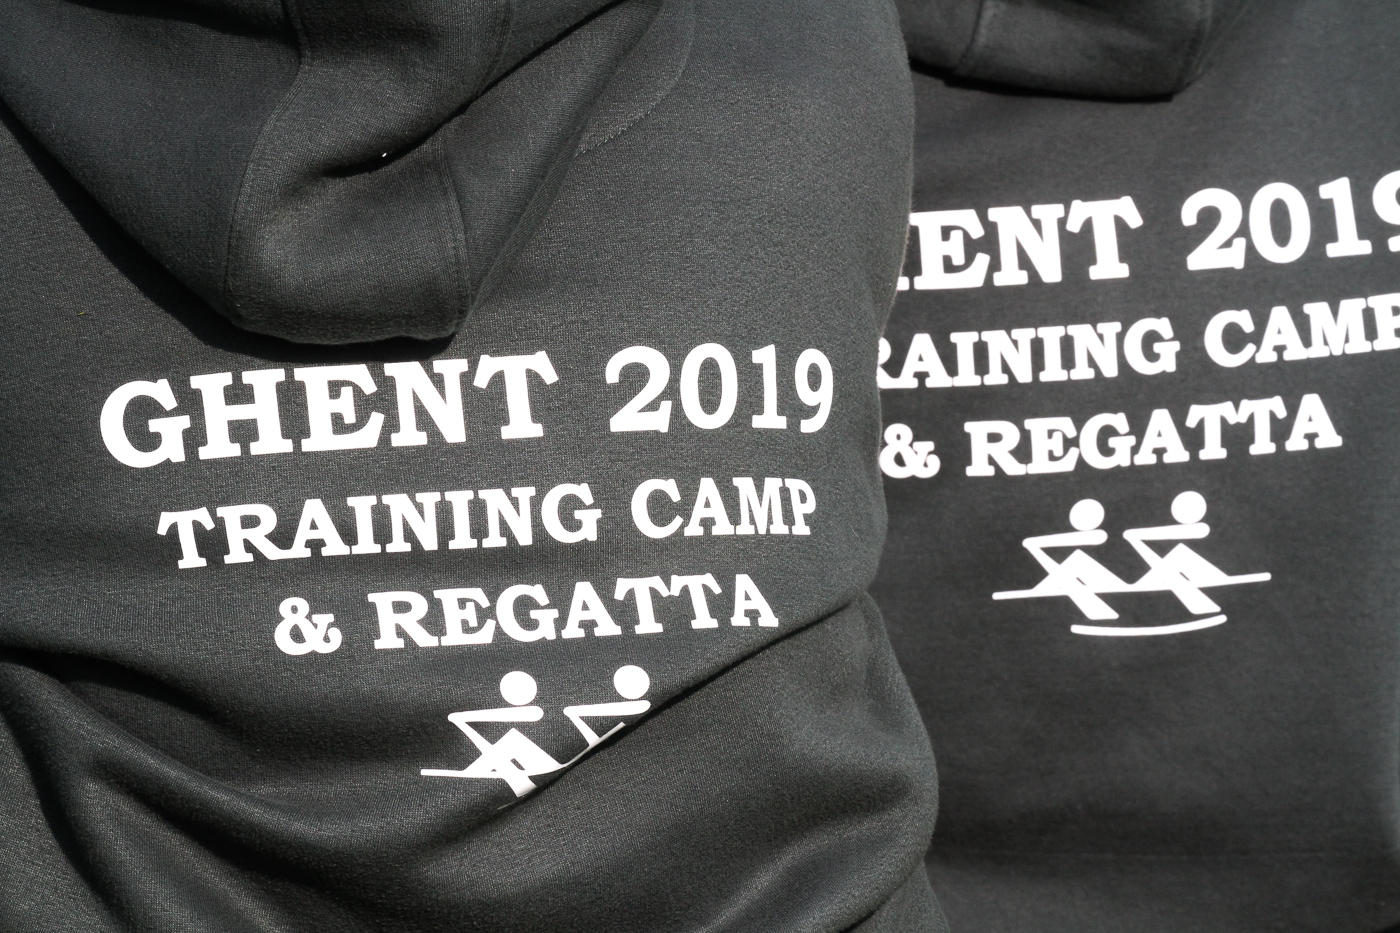 RCT_Gent_2019_029.jpg